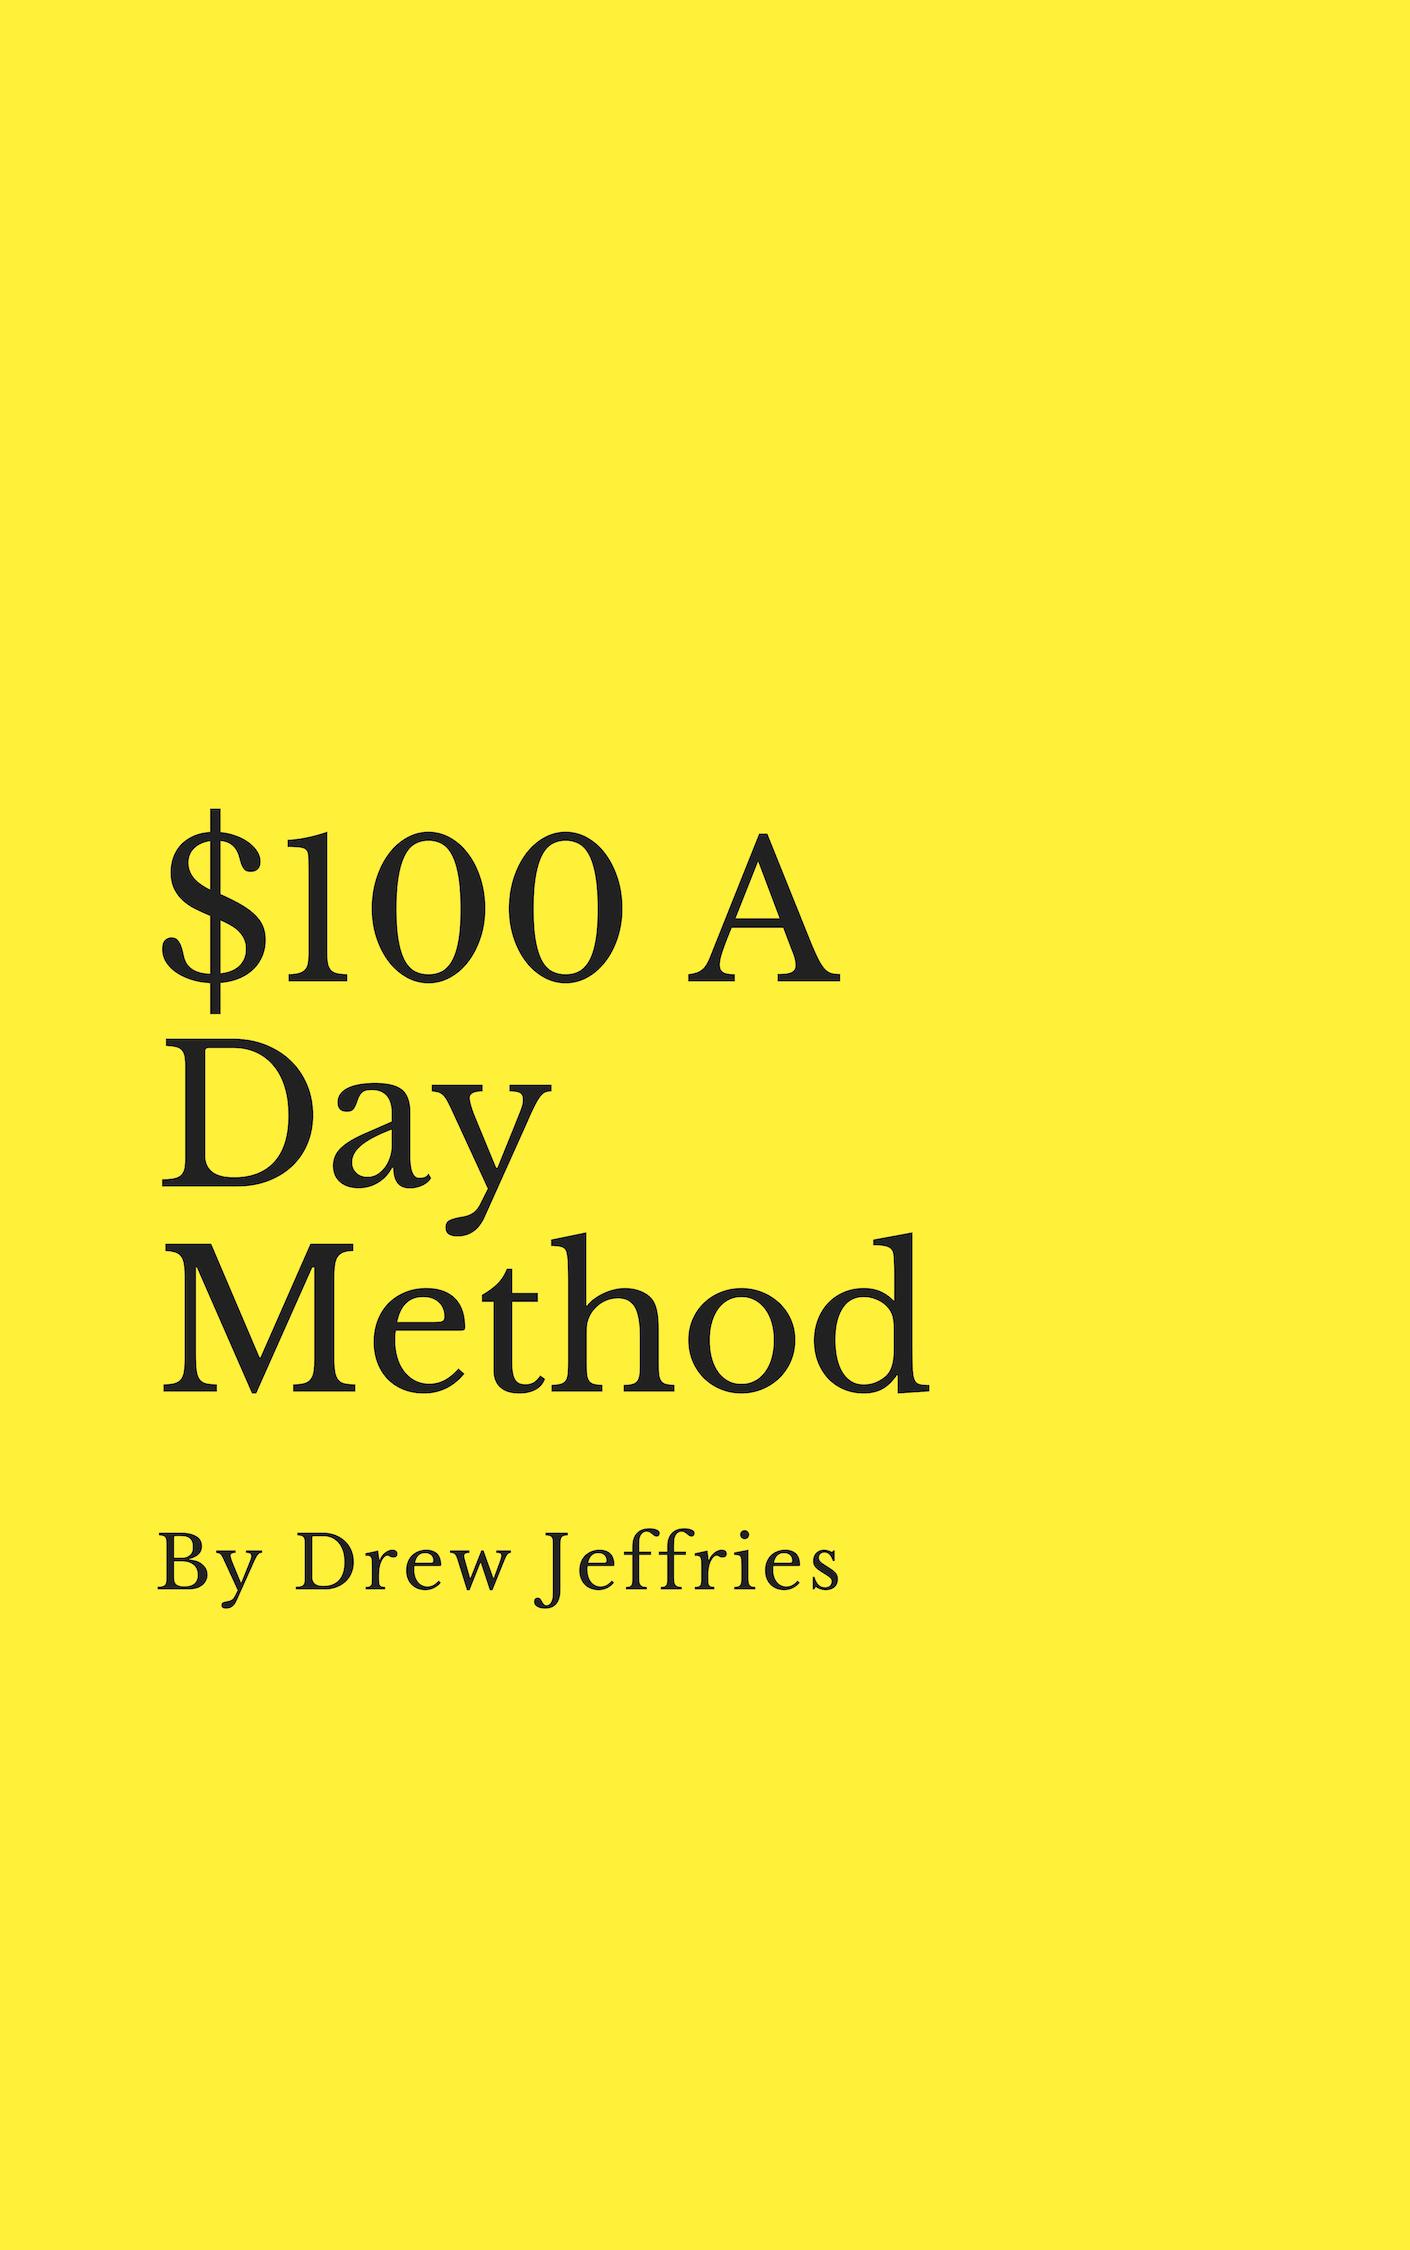 6 Ways To Make 100 A Day GUARANTEED Method!